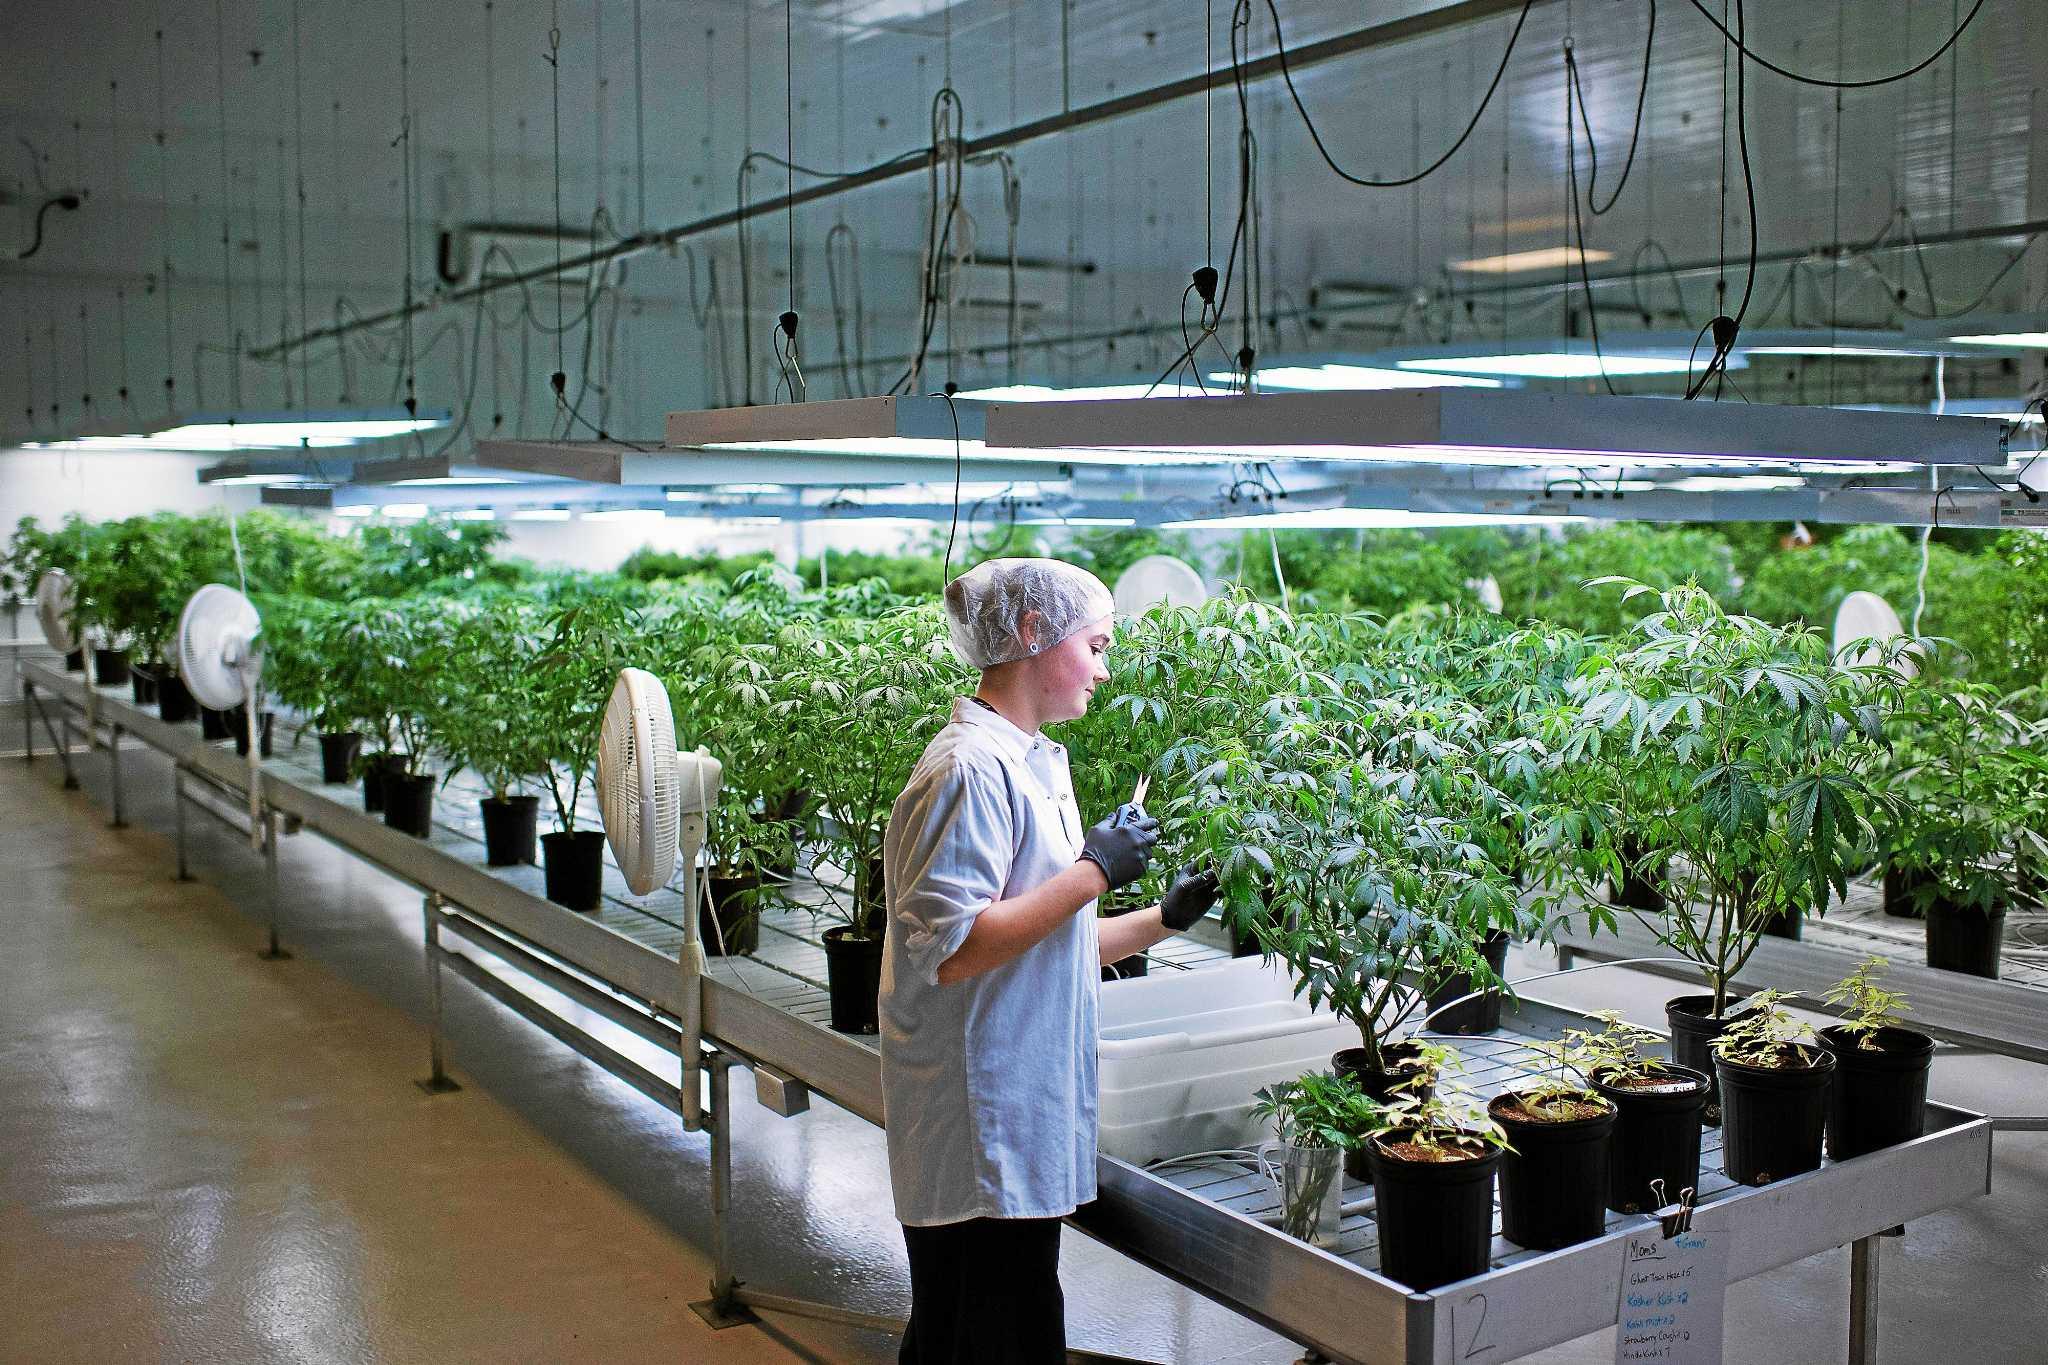 Partners in pot: Marijuana businesses seek novel collaborations